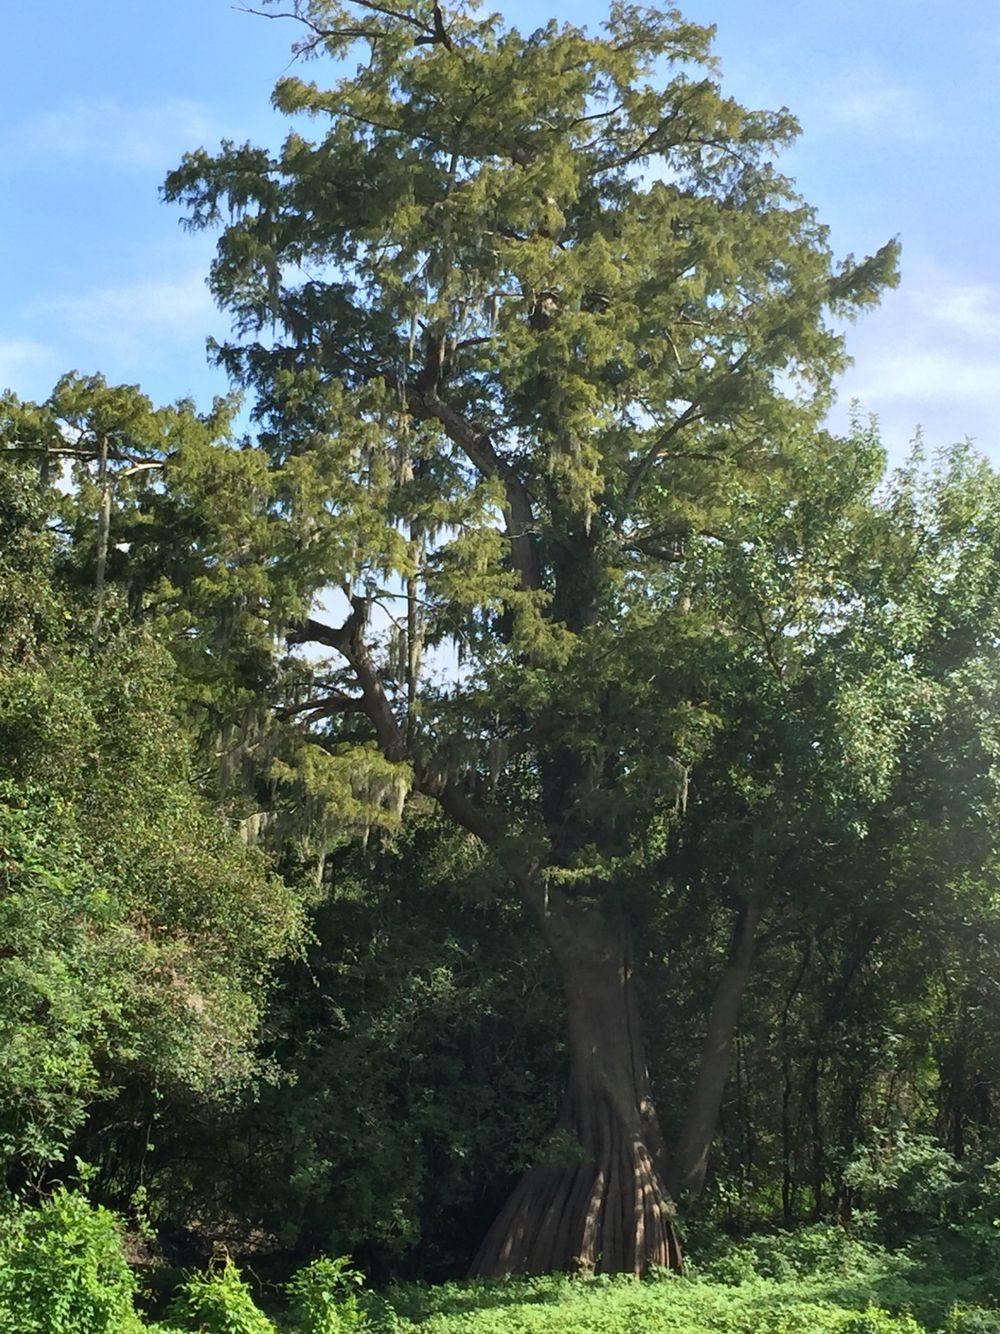 Cypress, hackberry and oaks in swamp bottom backwater of